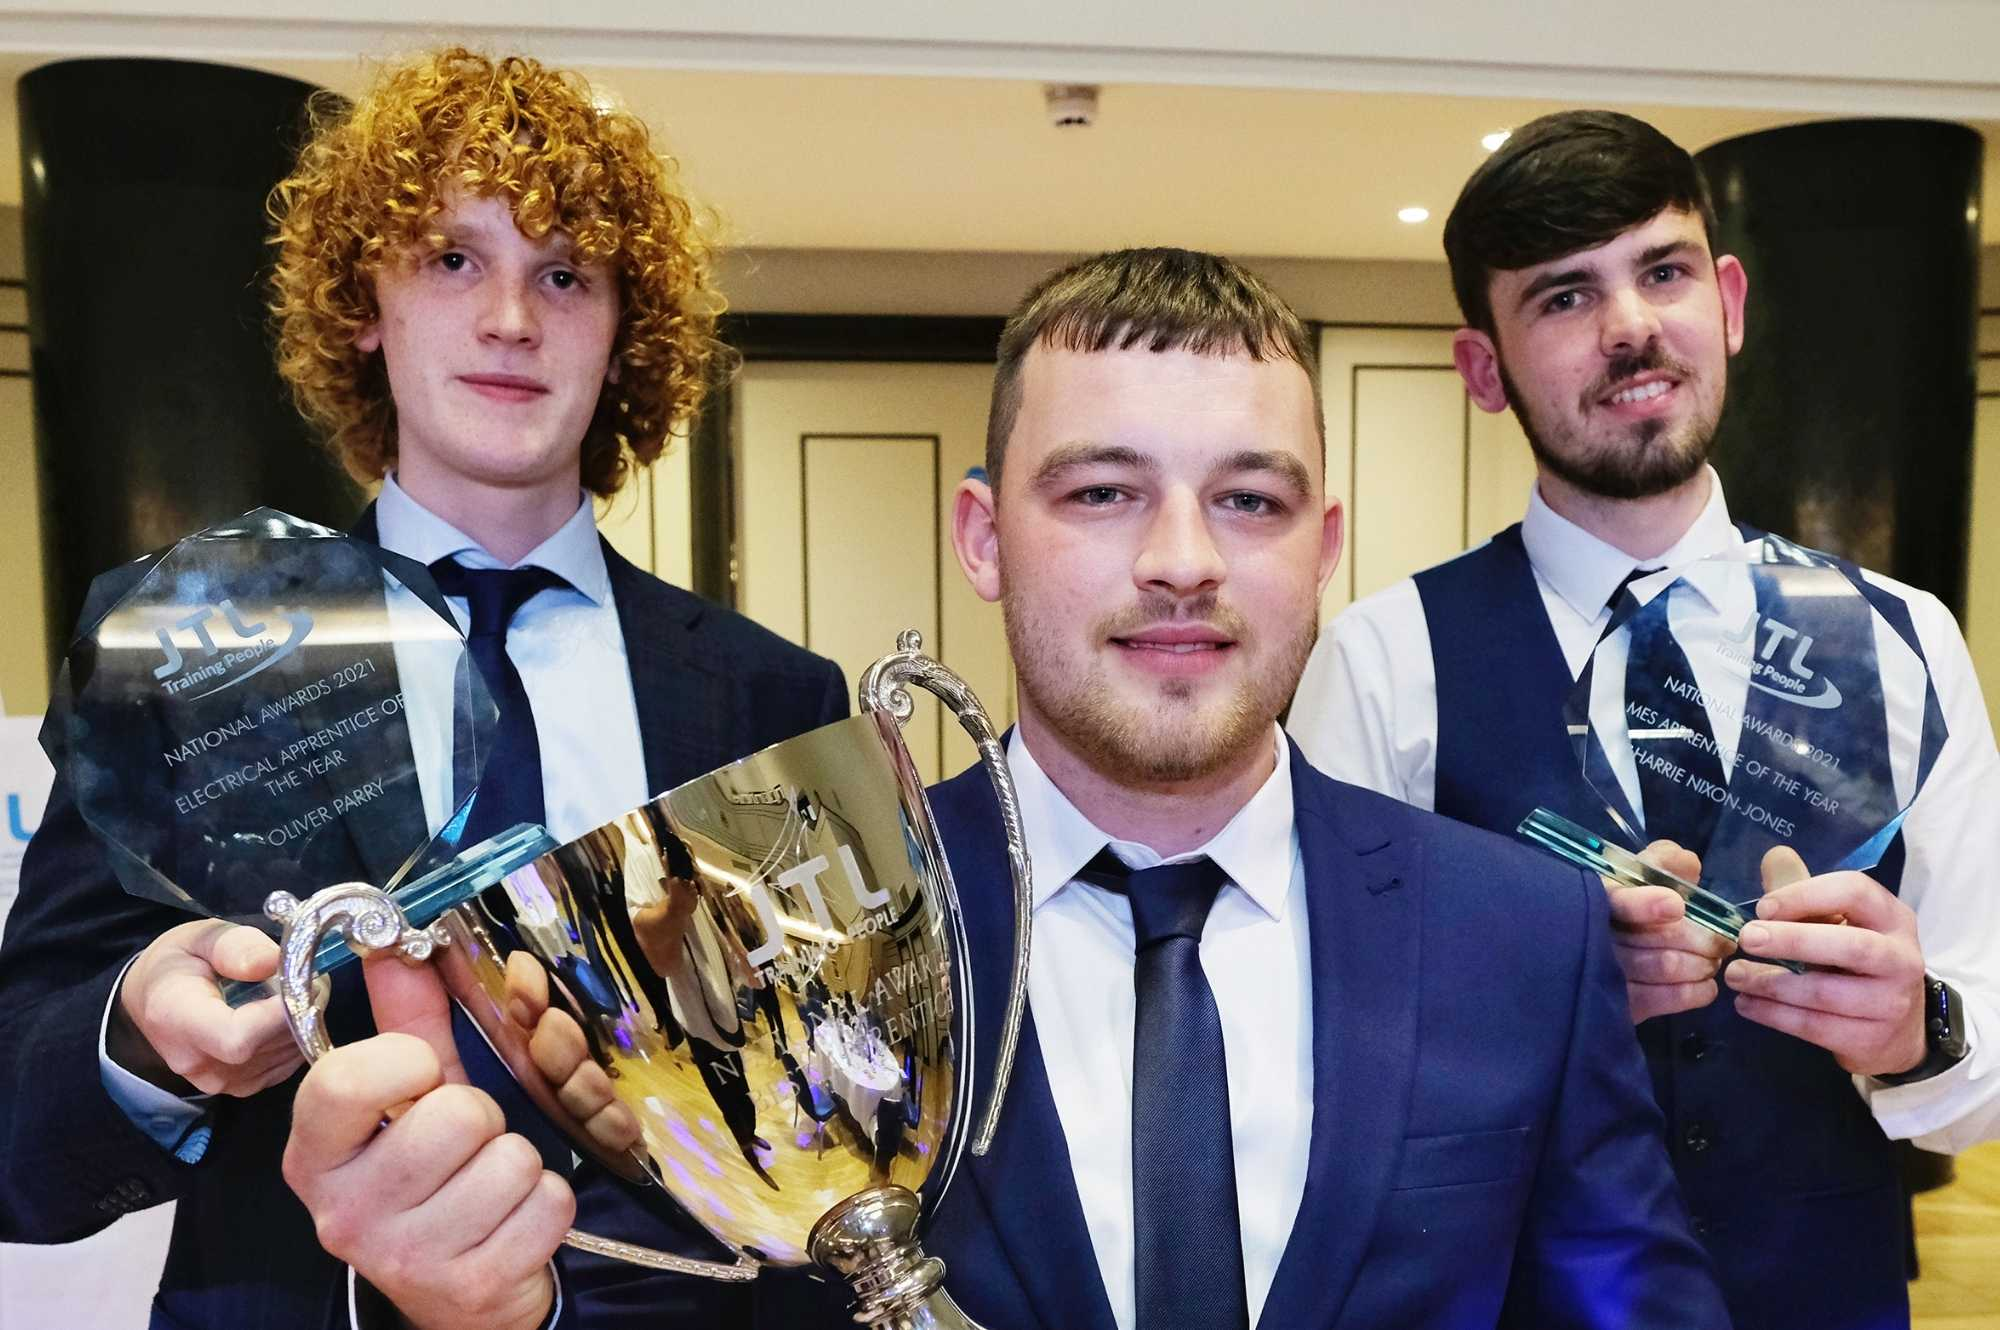 JTL National Awards 2021 Winners Announced